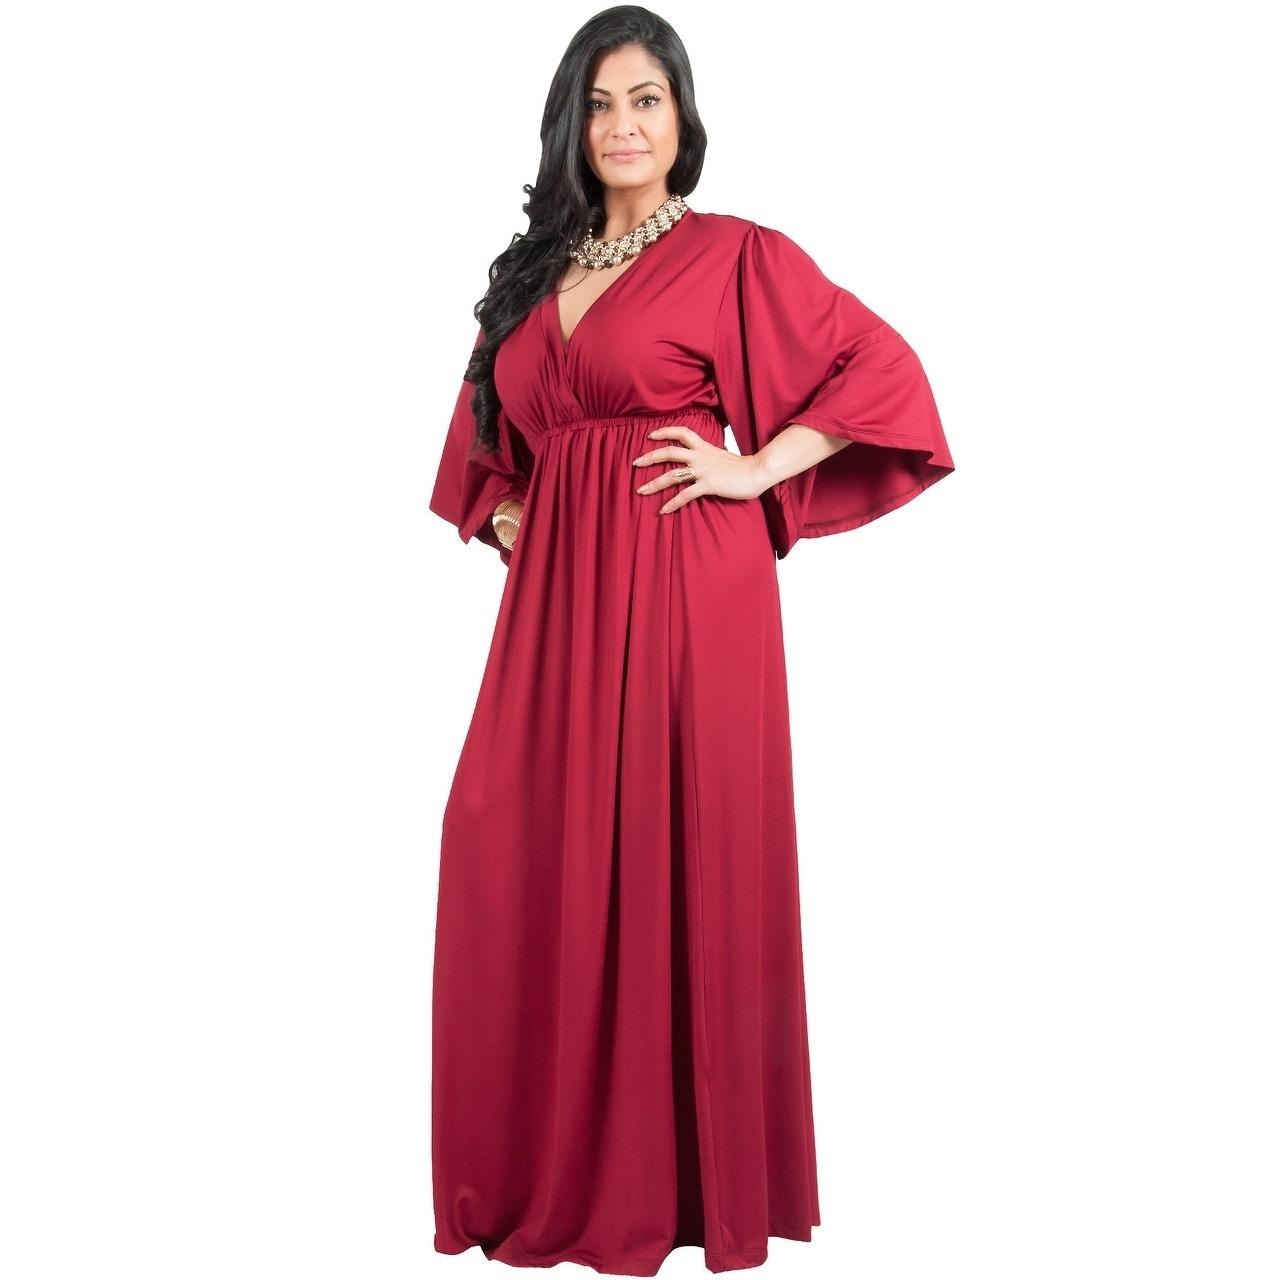 83b397263dd Shop Adelyn   Vivian Women s Plus-size Long Kimono Formal Flowy Evening  Maxi Dress - Free Shipping Today - Overstock - 14086303